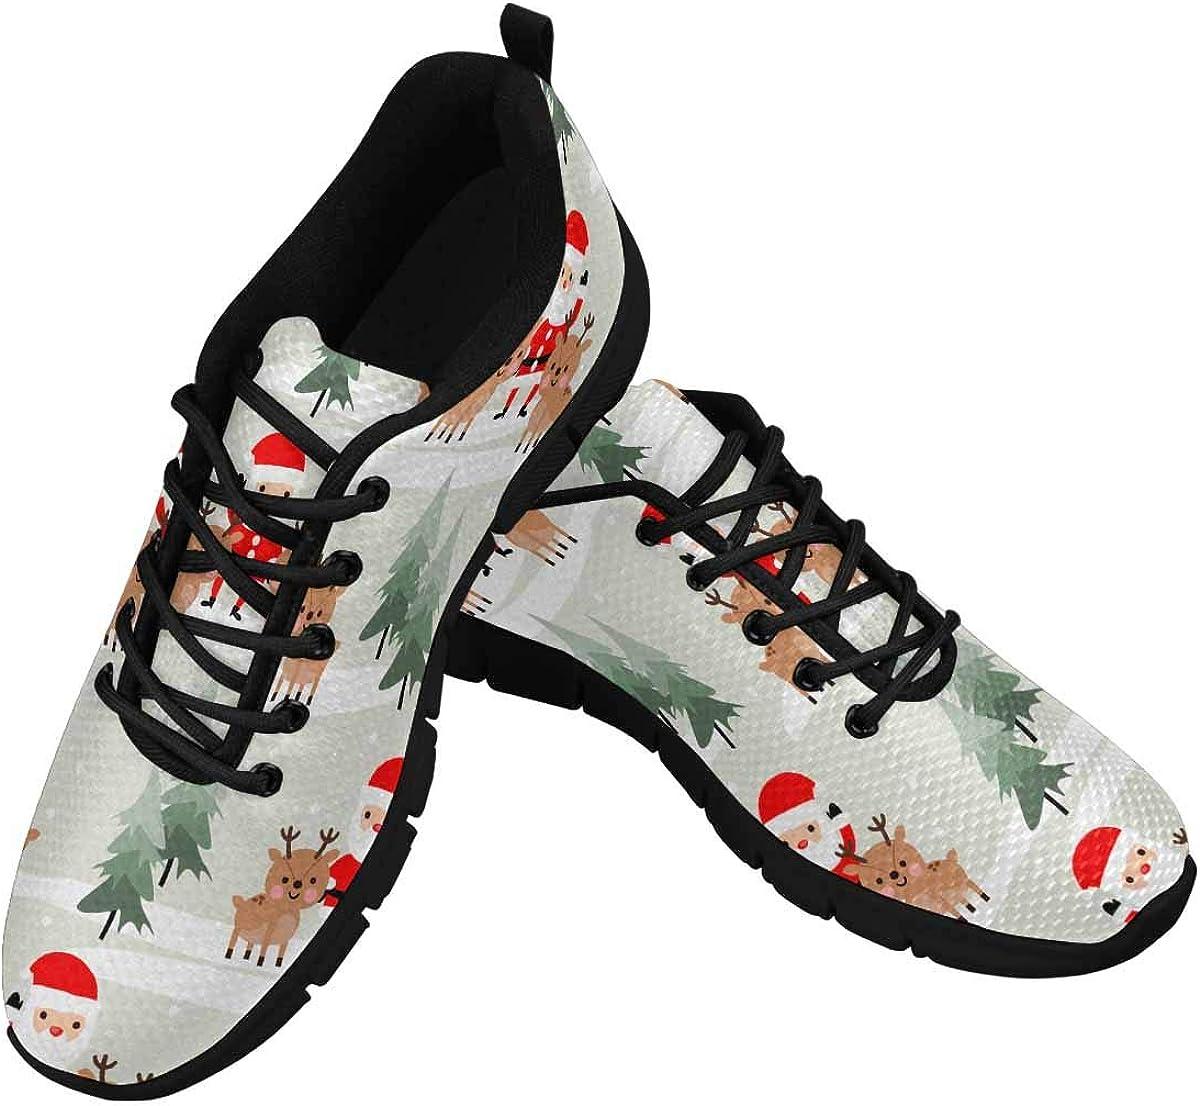 InterestPrint Cute Christmas Santa Claus and Reindeer Women's Athletic Walking Shoes Breathe Comfort Mesh